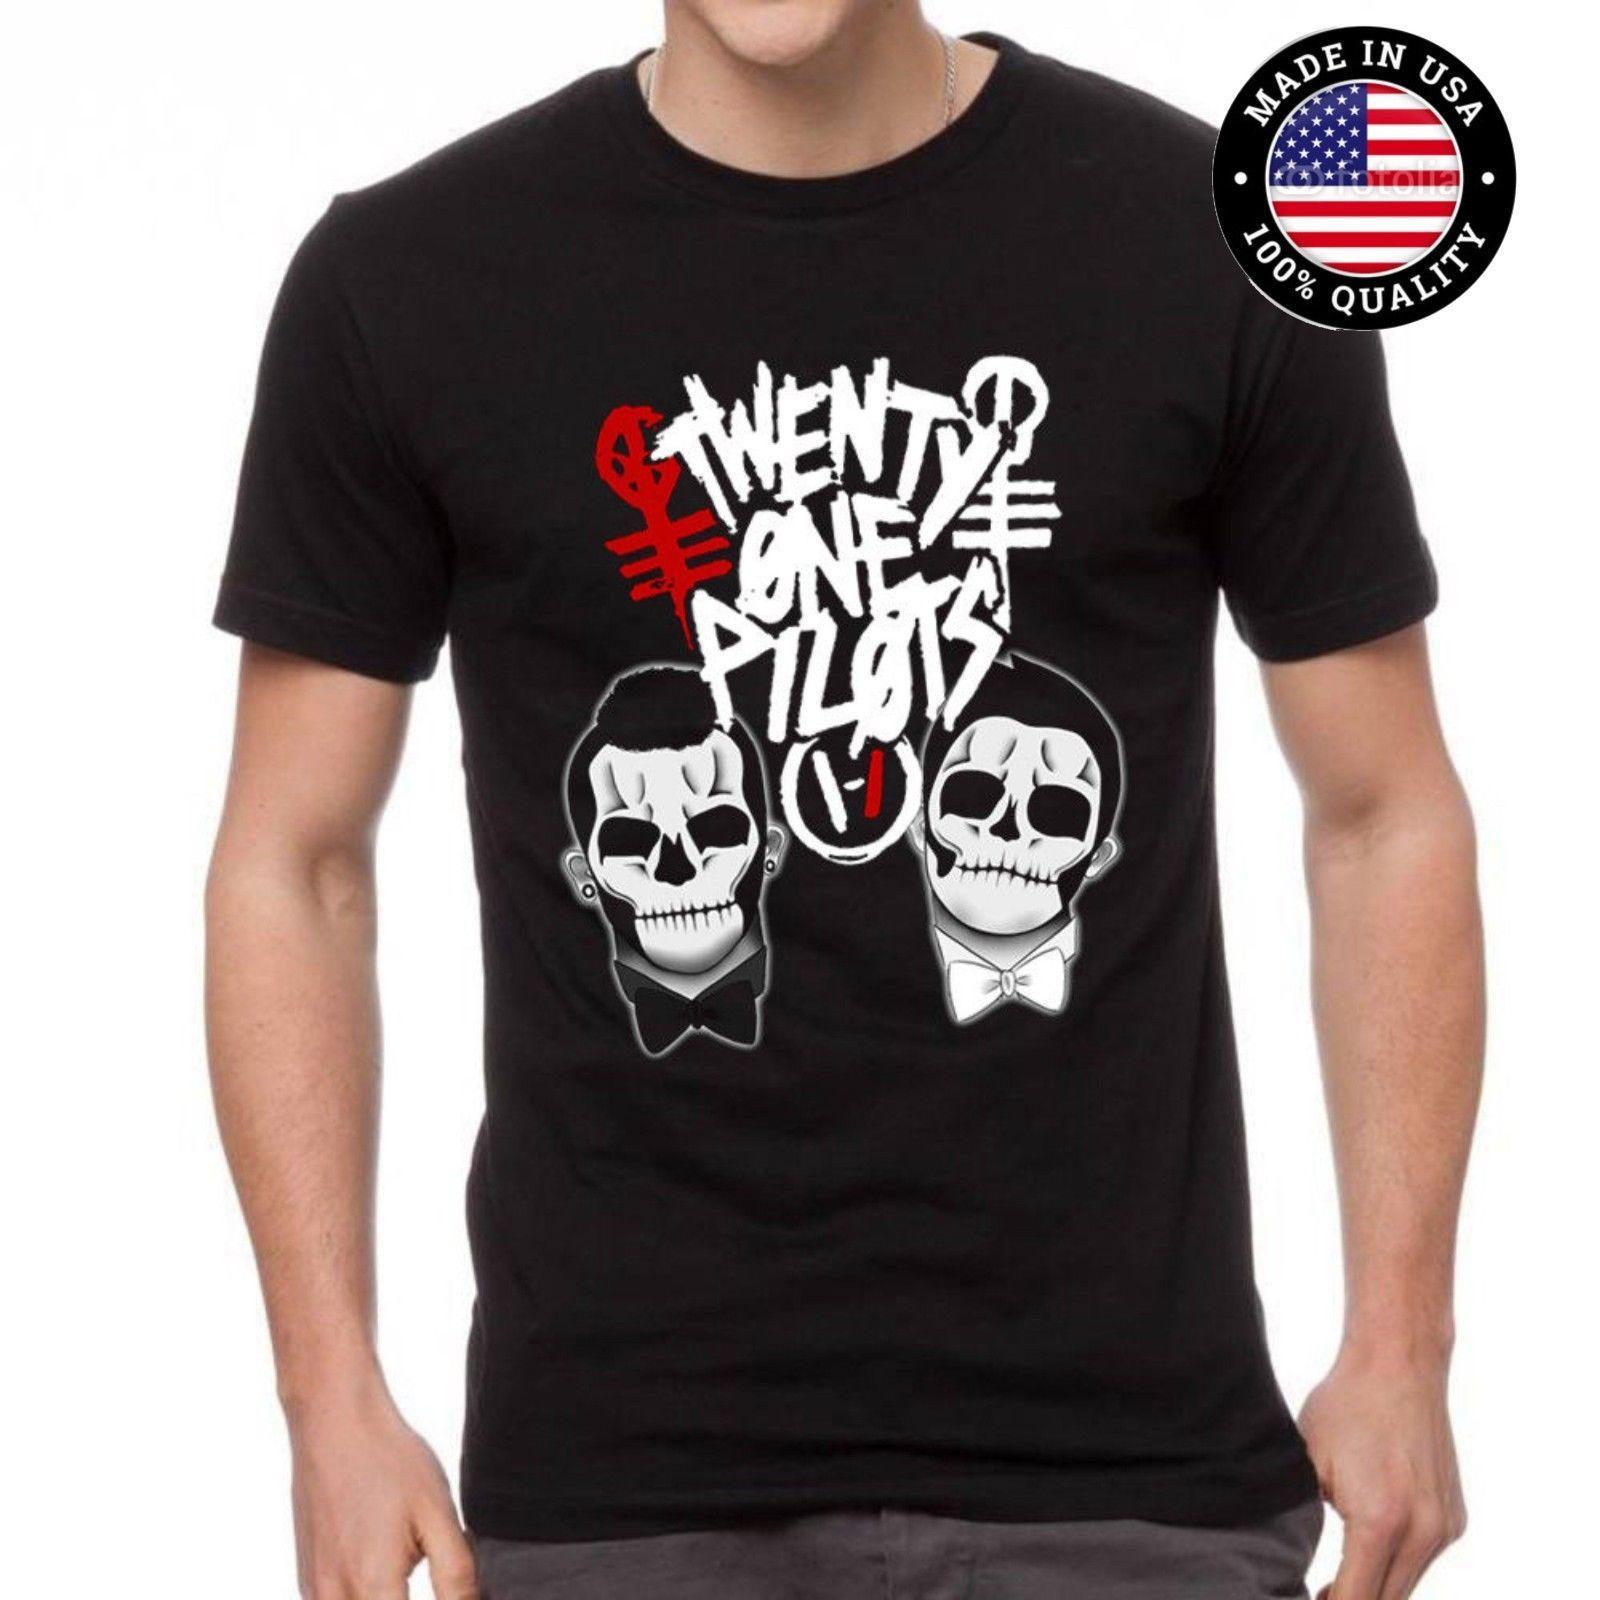 Twenty One Pilots Trench Bandito Blurryface 556 Camiseta De Calidad  Superior A  10.66 Del Besttshirts201801  fa1336756319c